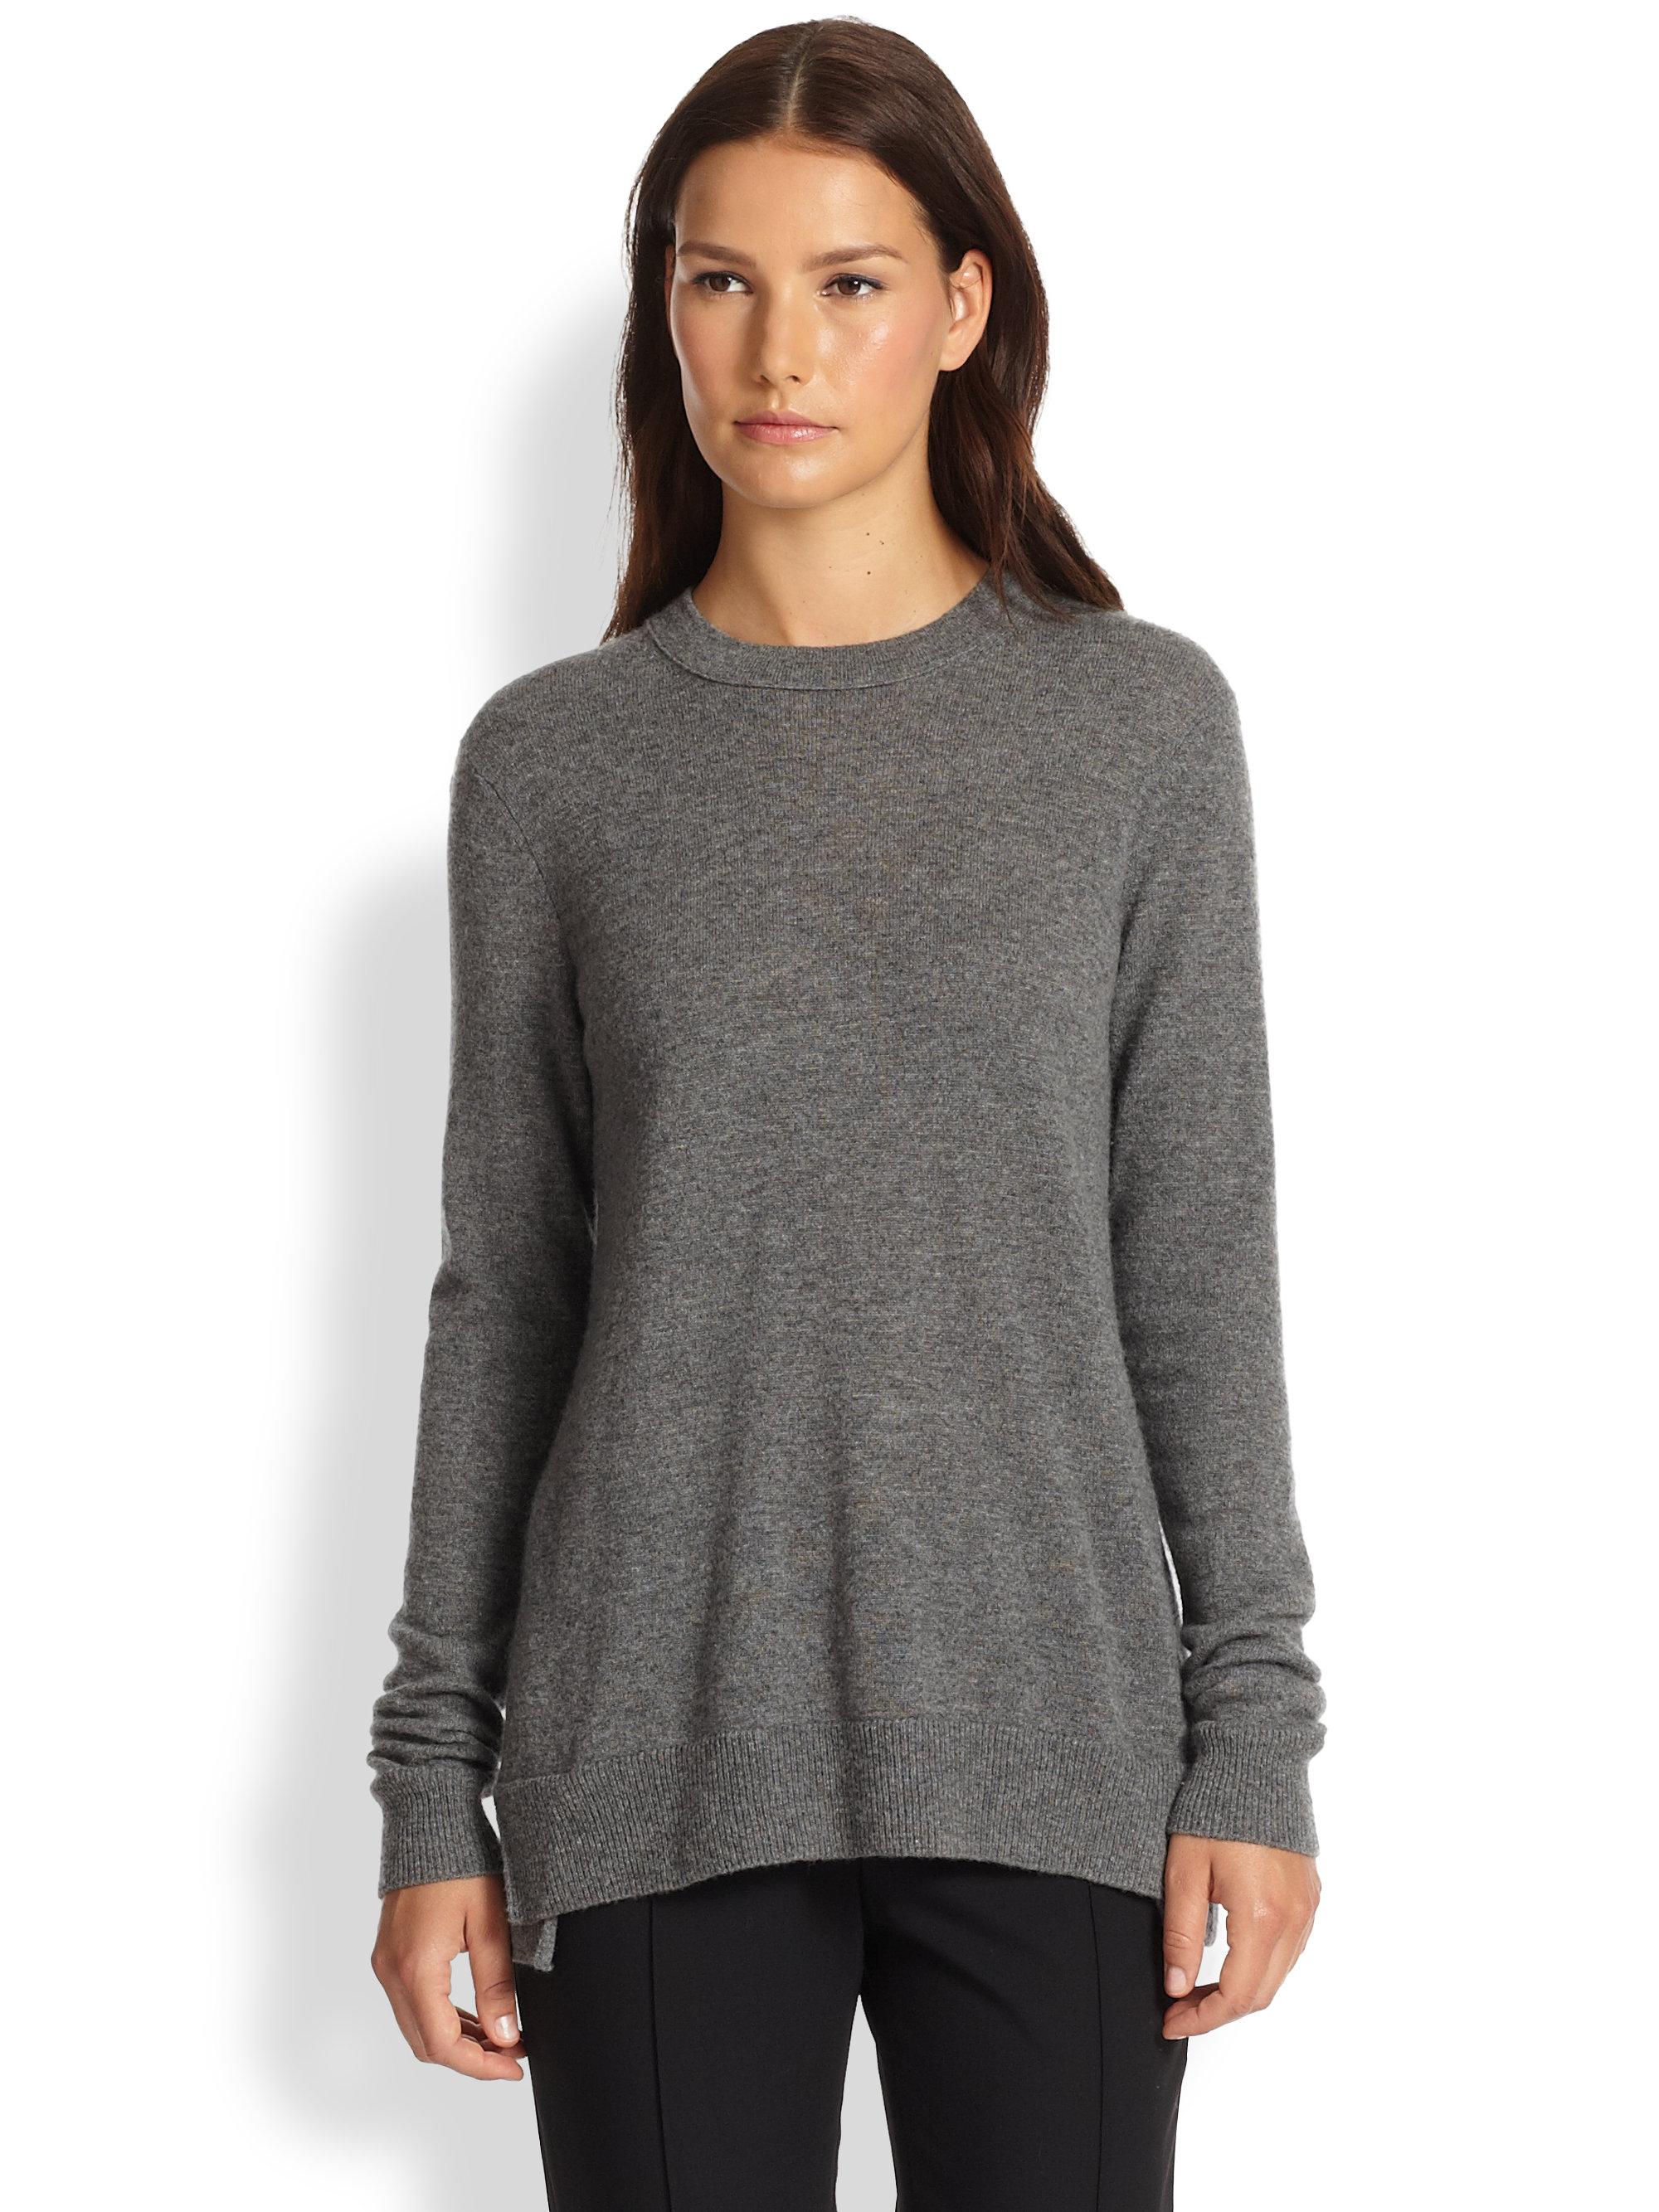 Clearance Online Wholesale Price Sale Online round neck sweater - Grey Vince Sale Professional Explore Cheap Price ckcxAZEk